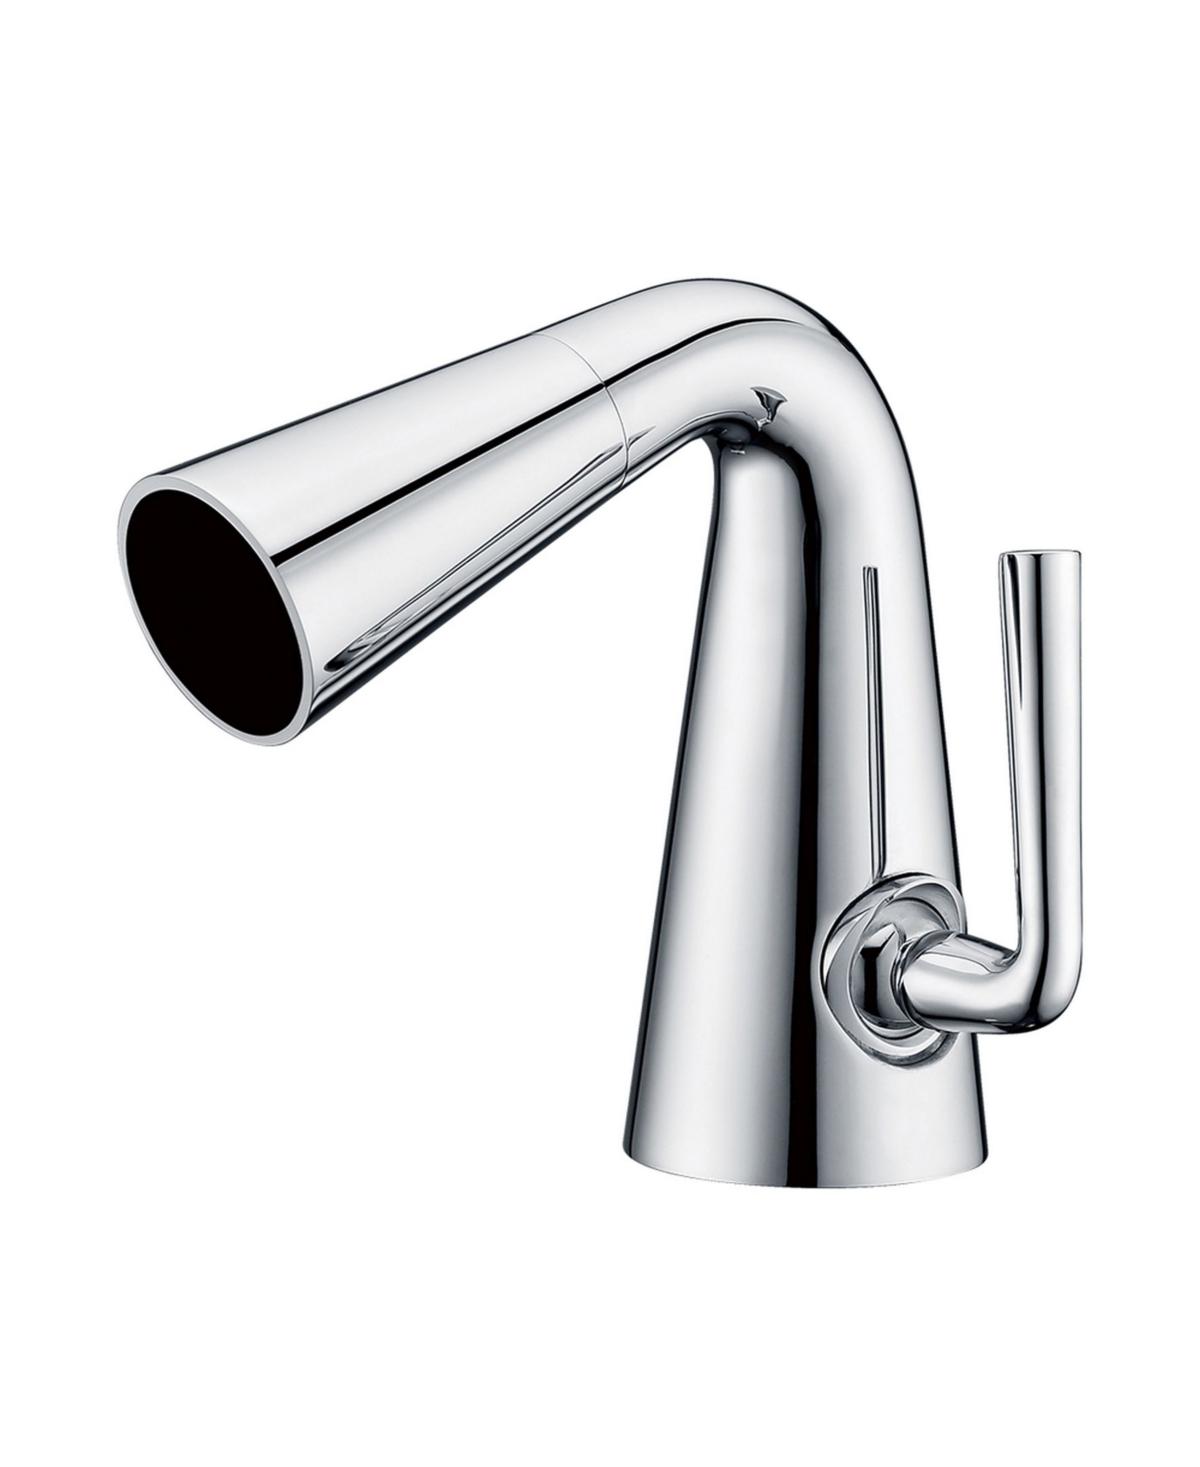 Alfi brand Polished Chrome Single Hole Cone Waterfall Bathroom Faucet Bedding